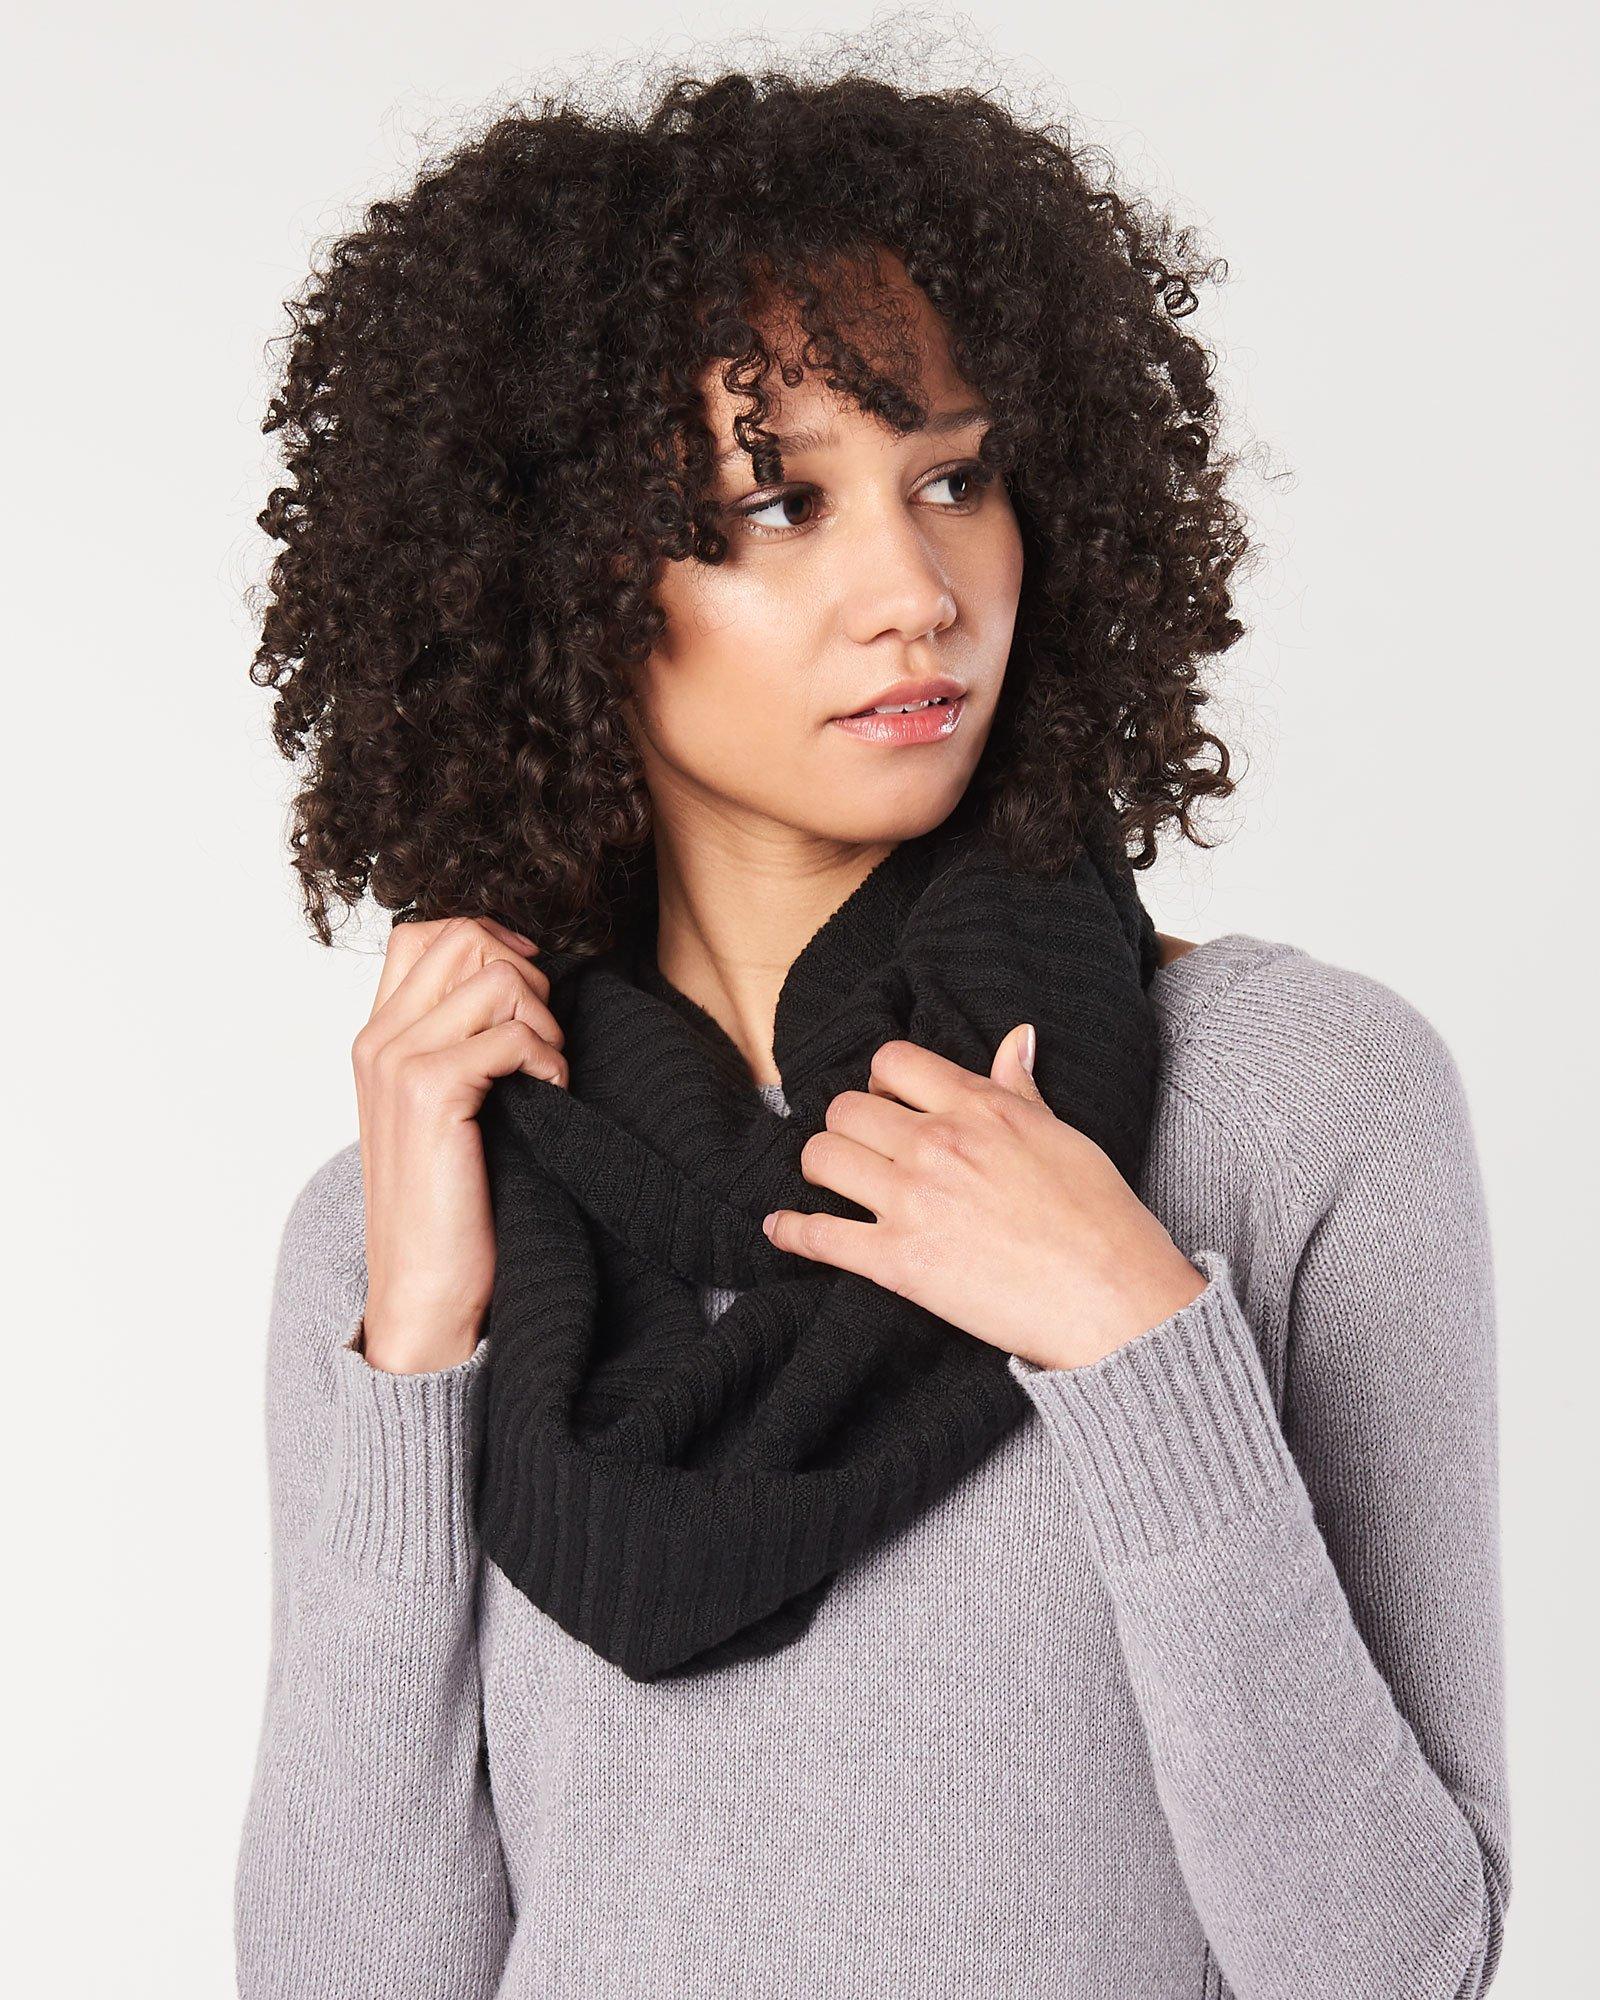 d65bcd99cee85 Hoodlamb s sustainably made vegan infinity scarf